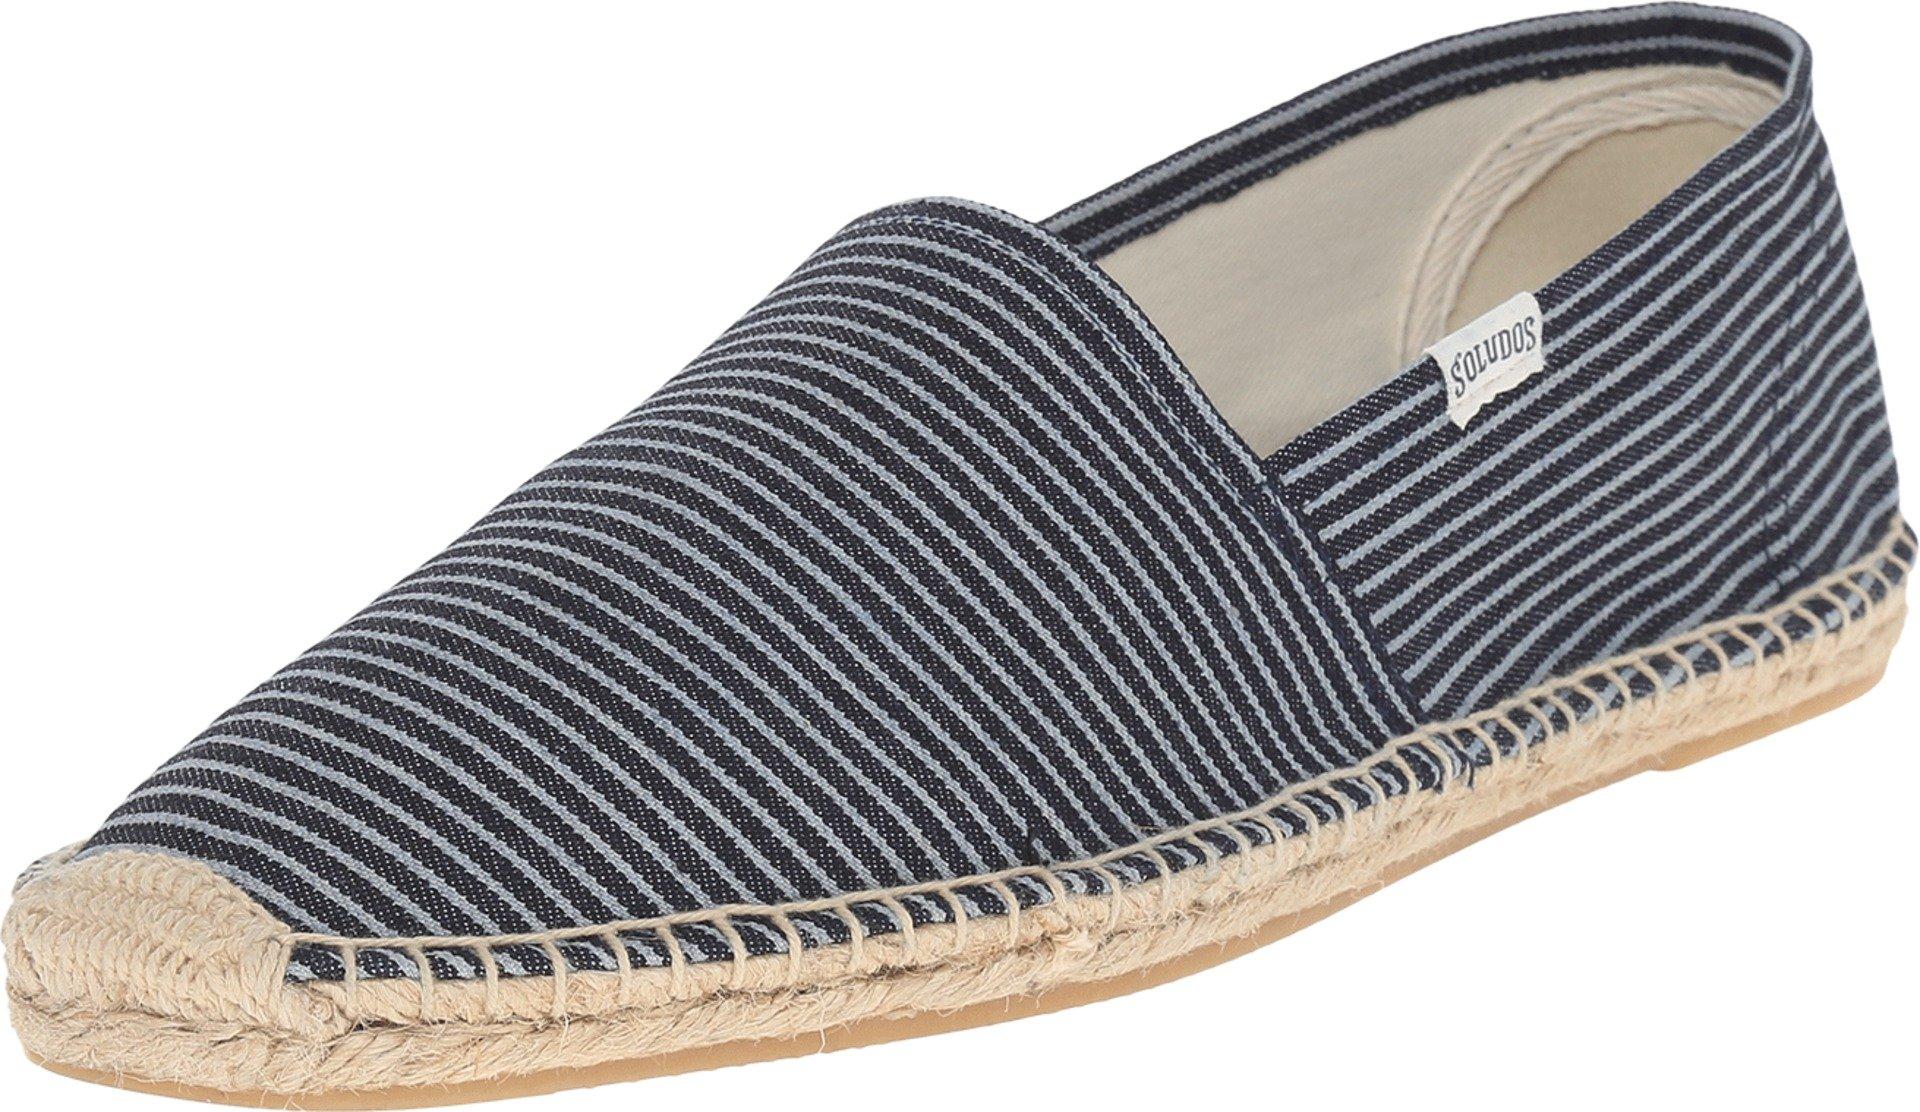 Soludos Dali Stripe Men's Original Classic Sandal, Blue/White, 11.5 D US